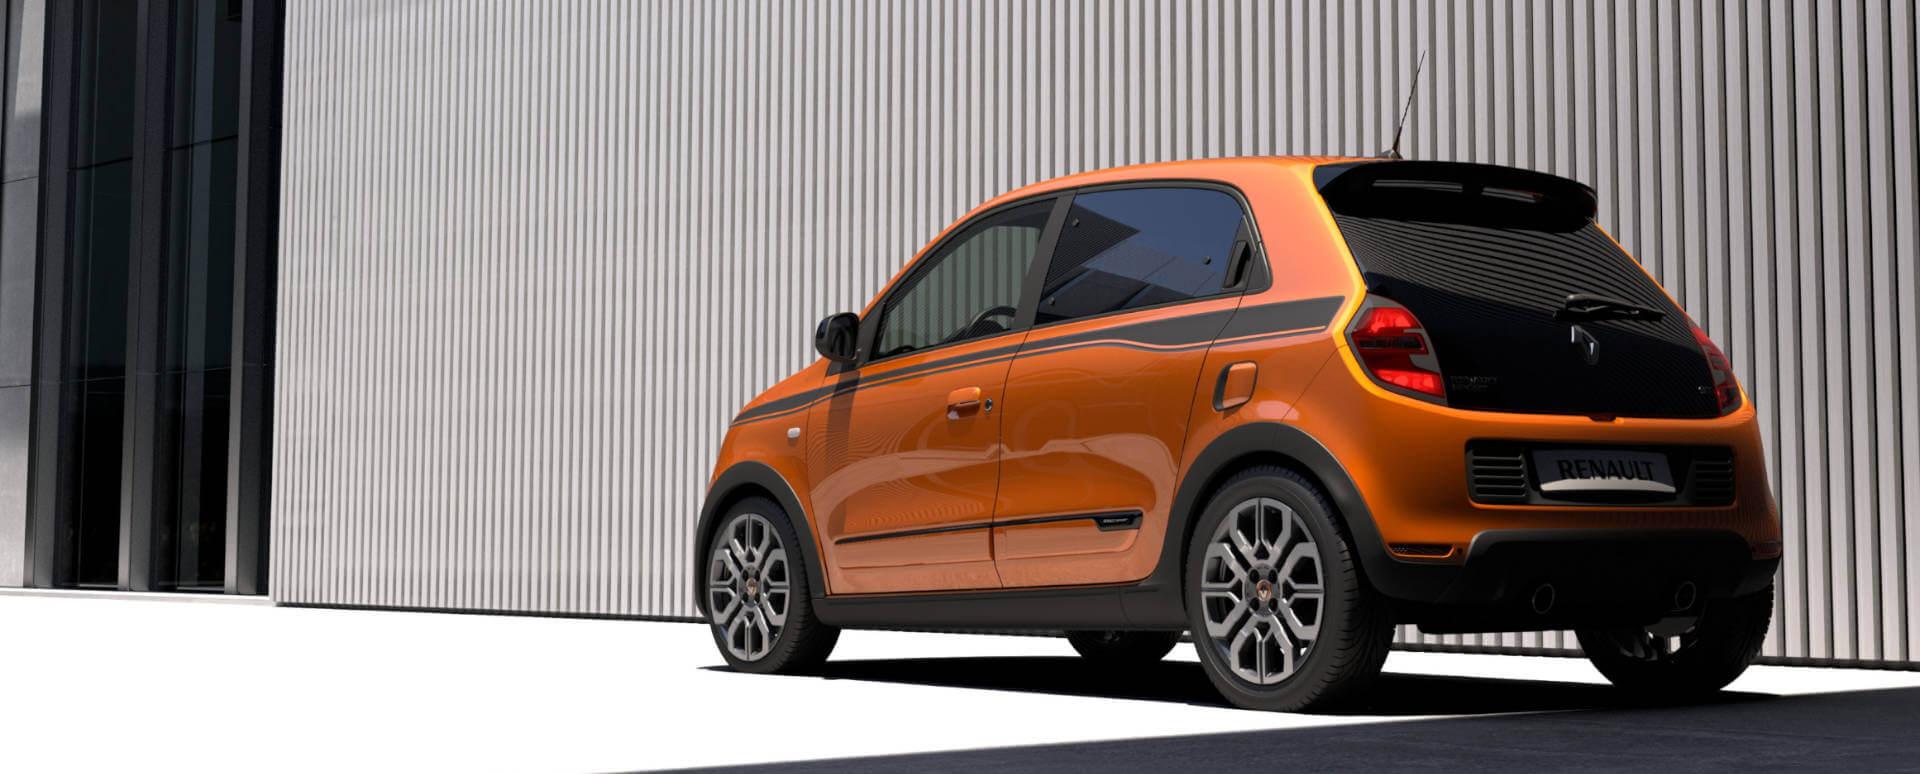 Renault Twingo, Rear